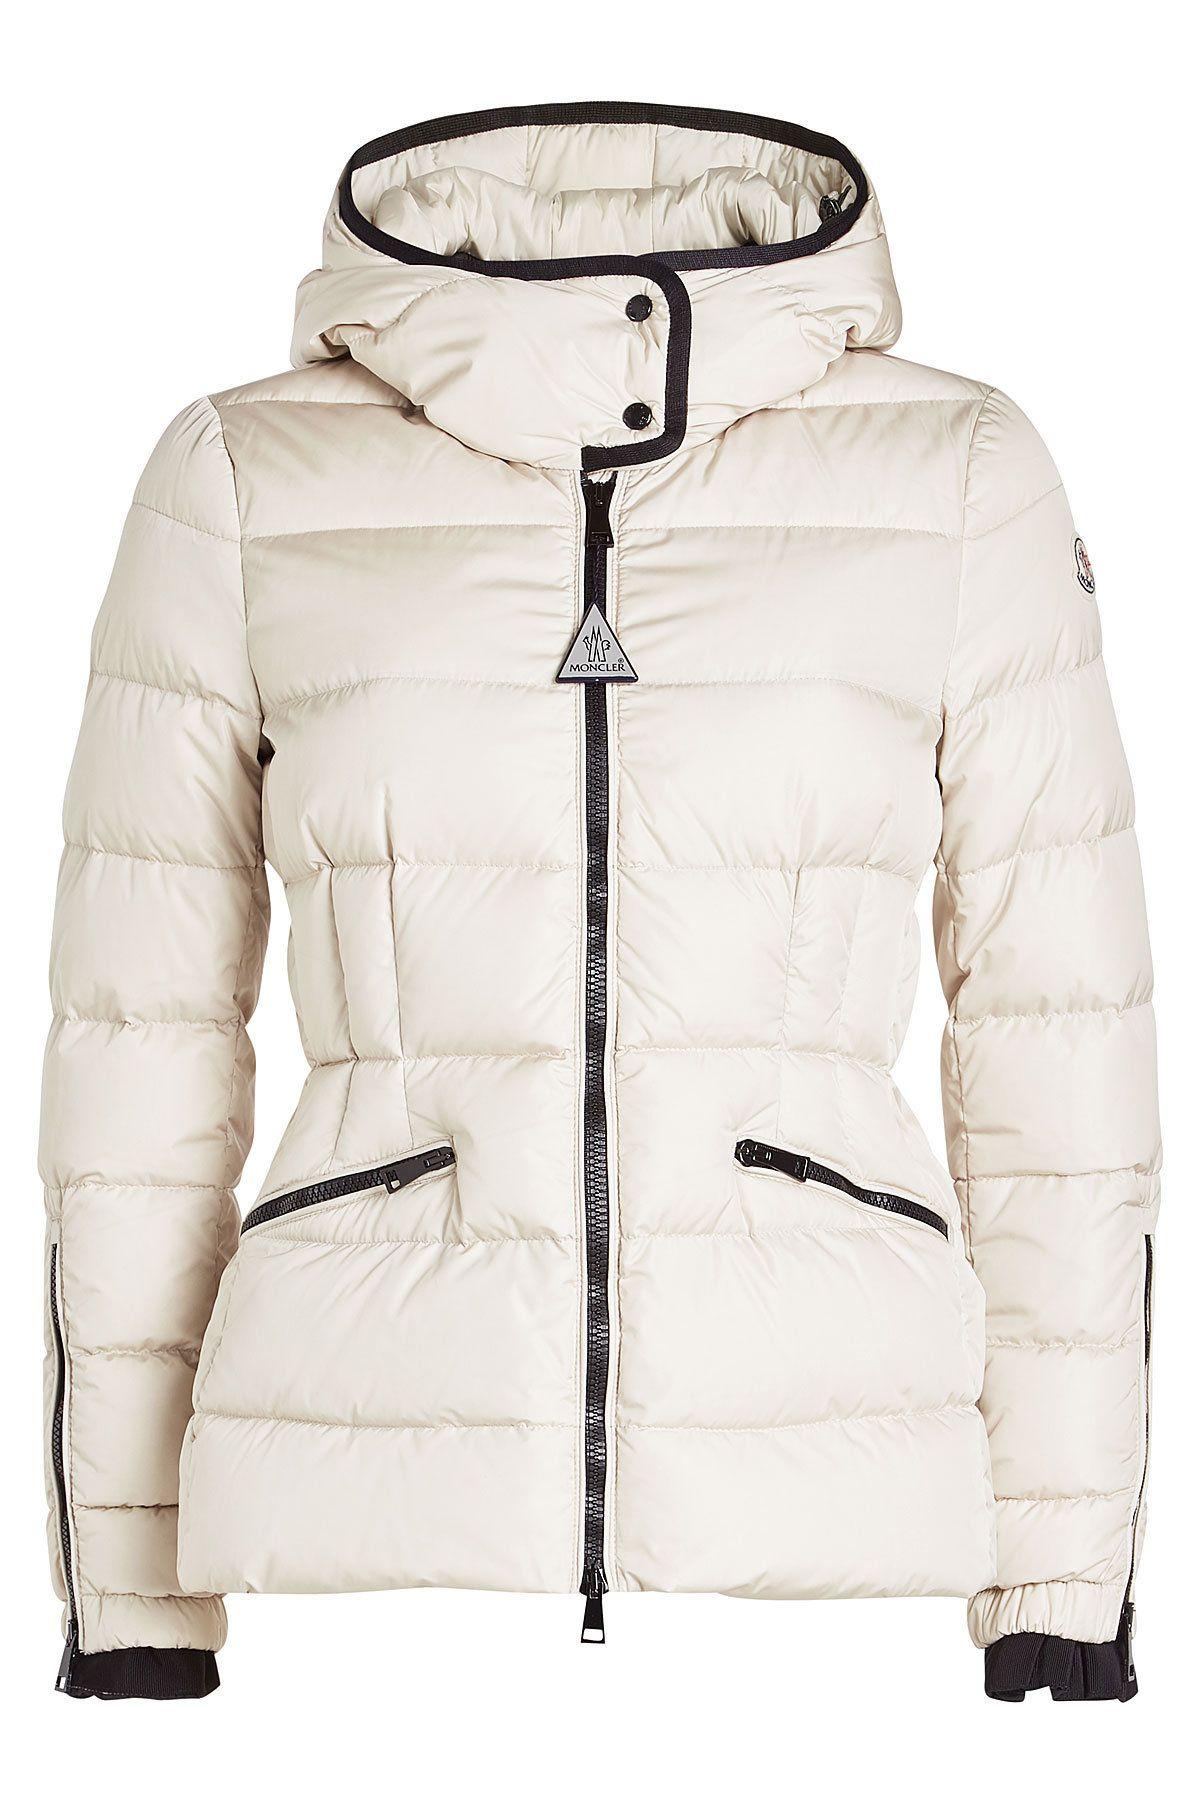 1852cf0b5703 MONCLER Betula Down Jacket in White